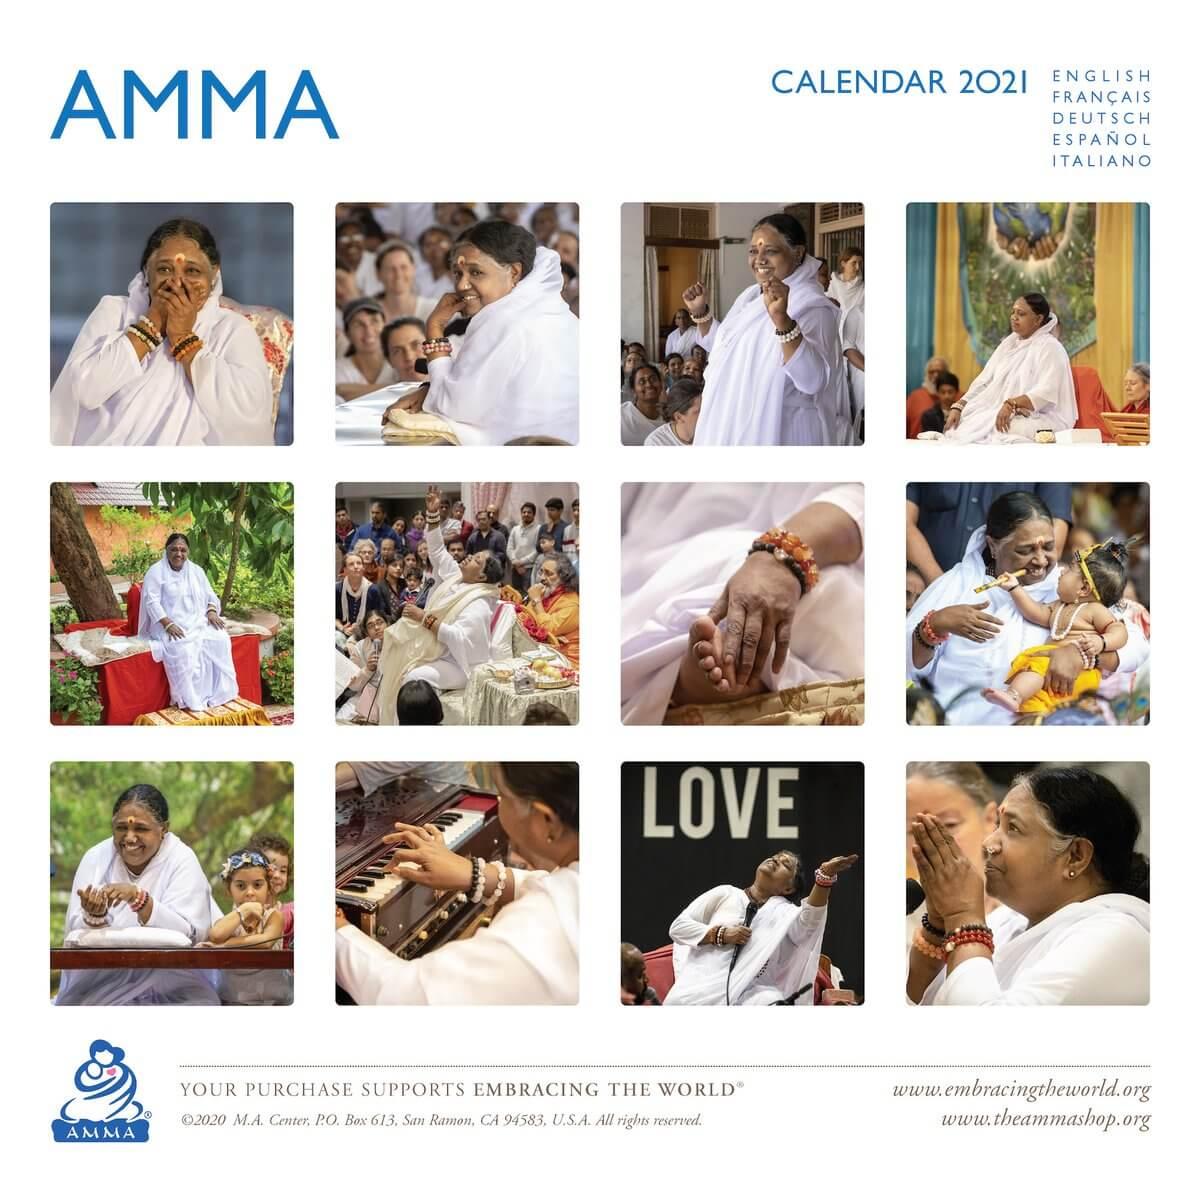 AMMA 2021 Calendar